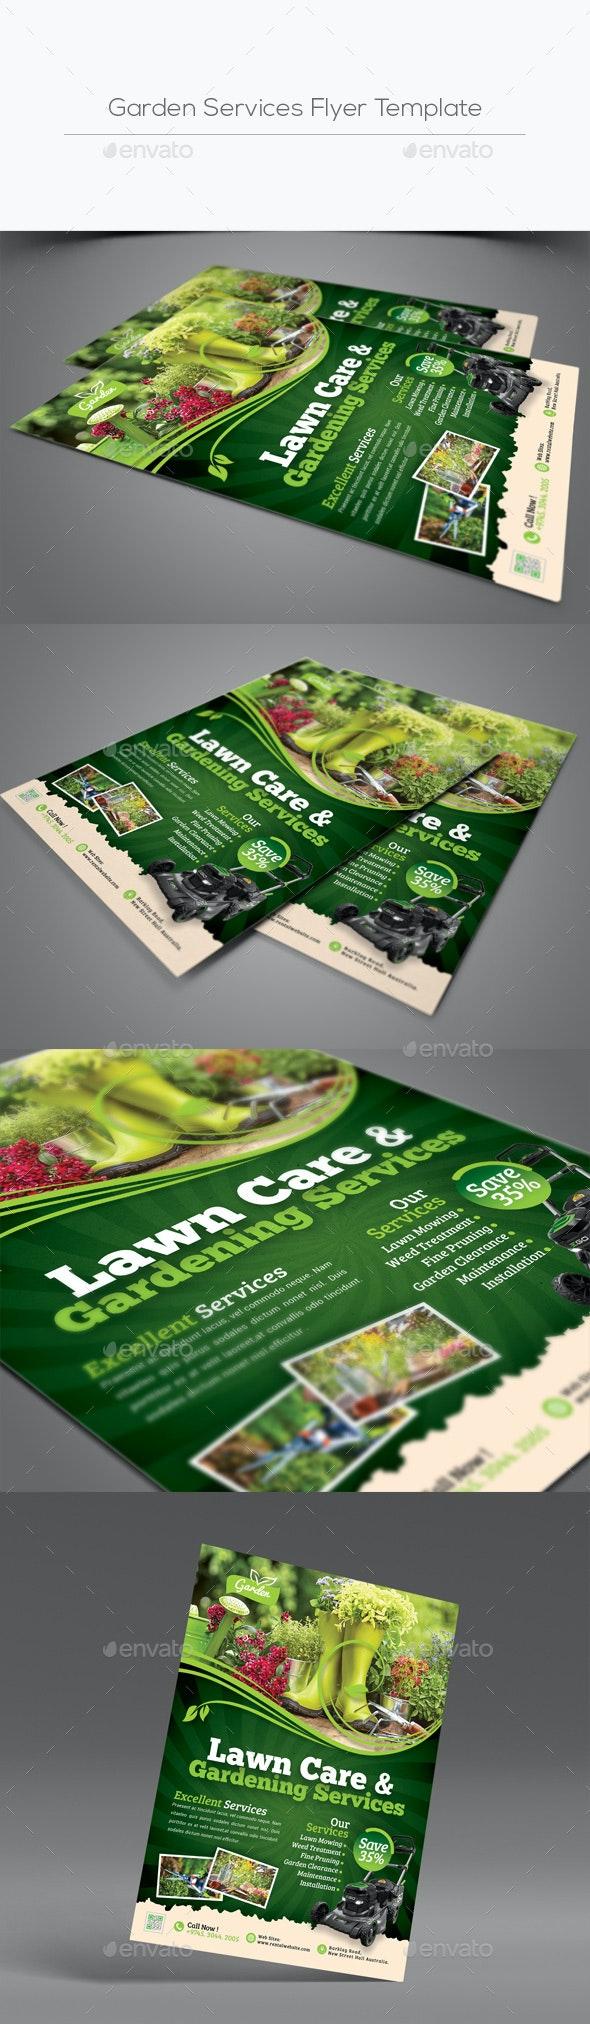 Garden Services Flyer Template - Flyers Print Templates